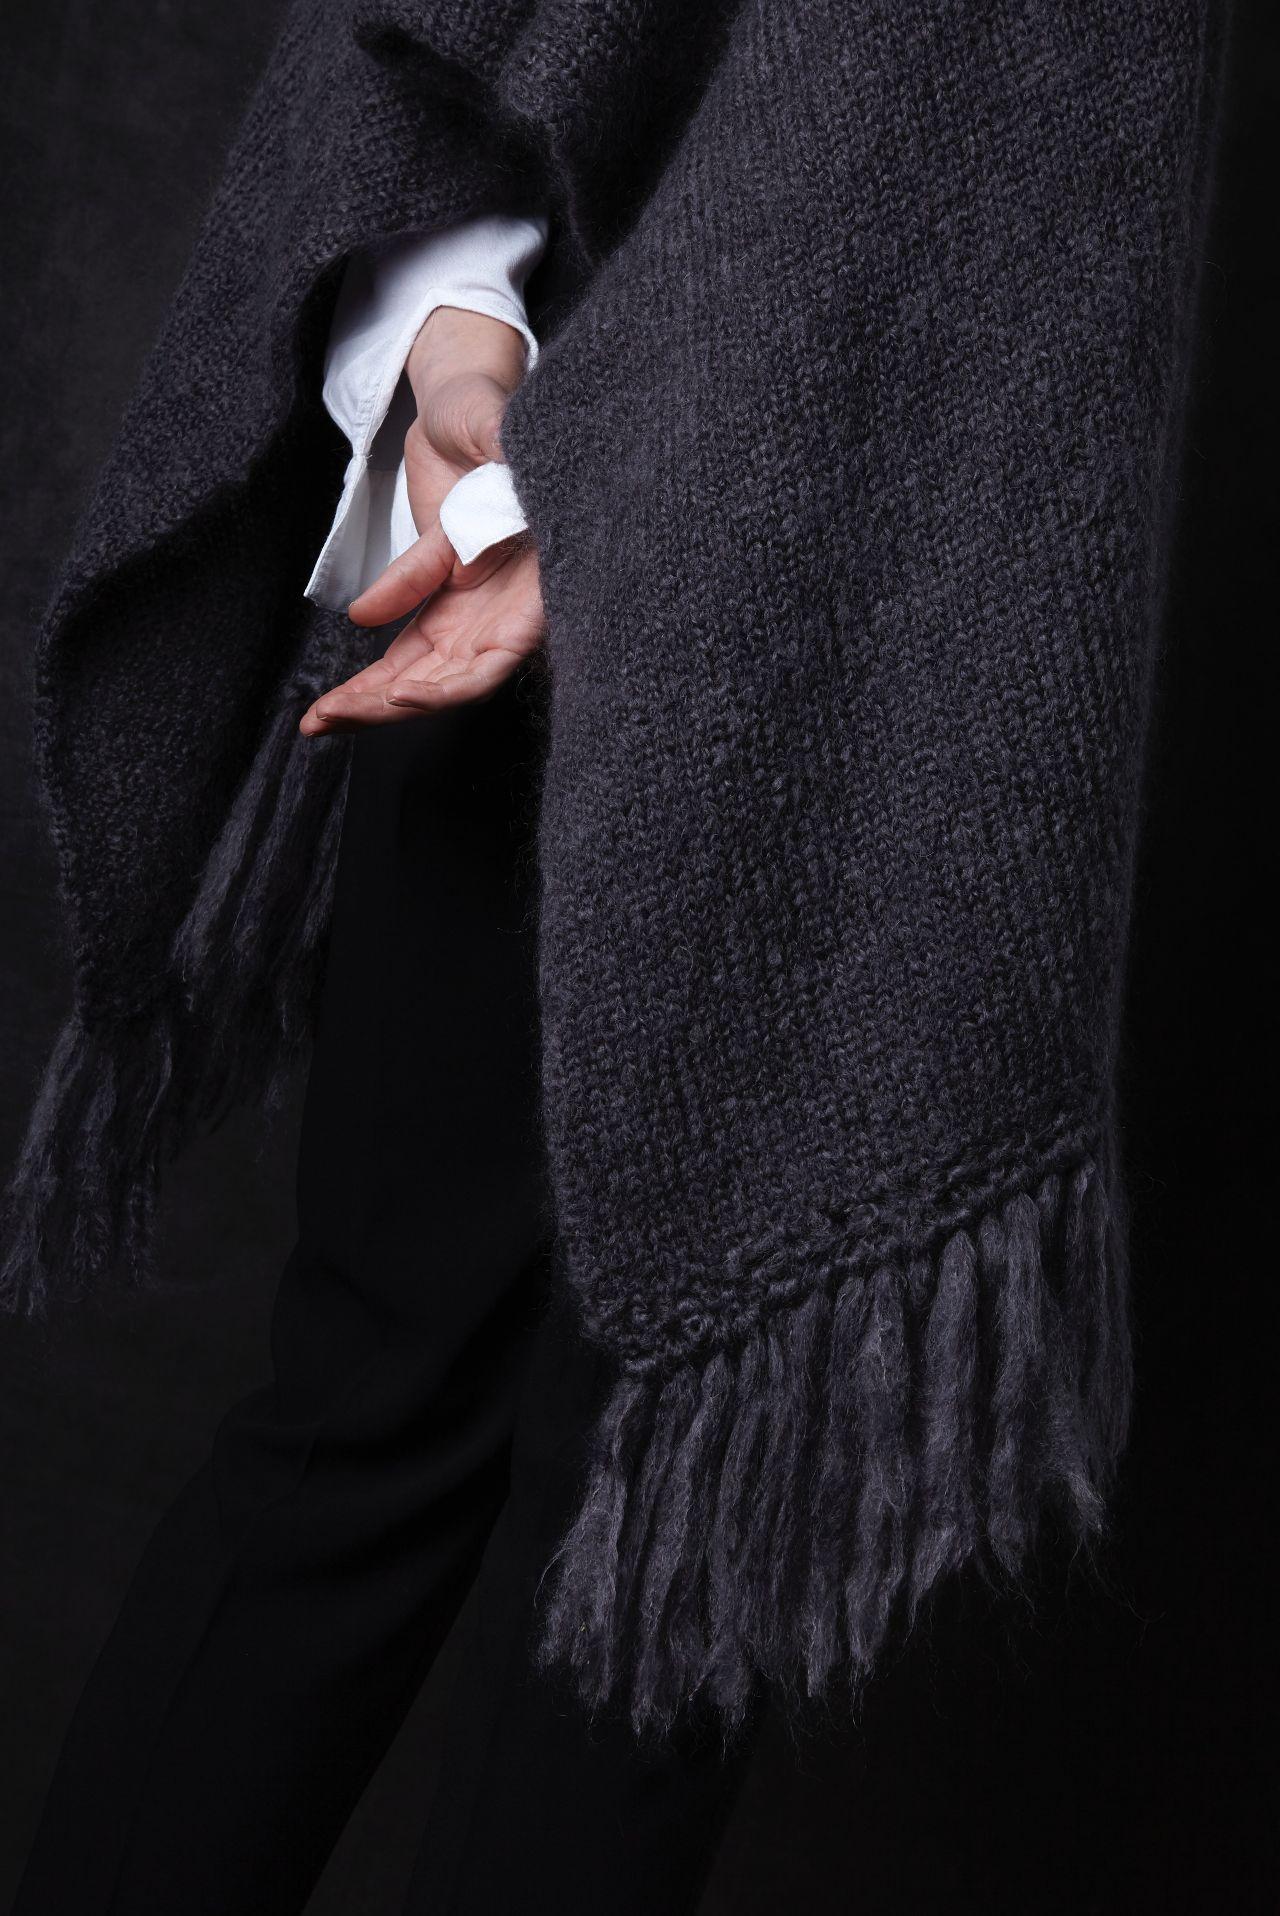 Juul mohair wool dark gray shawl from Dutch goats detail fringe.